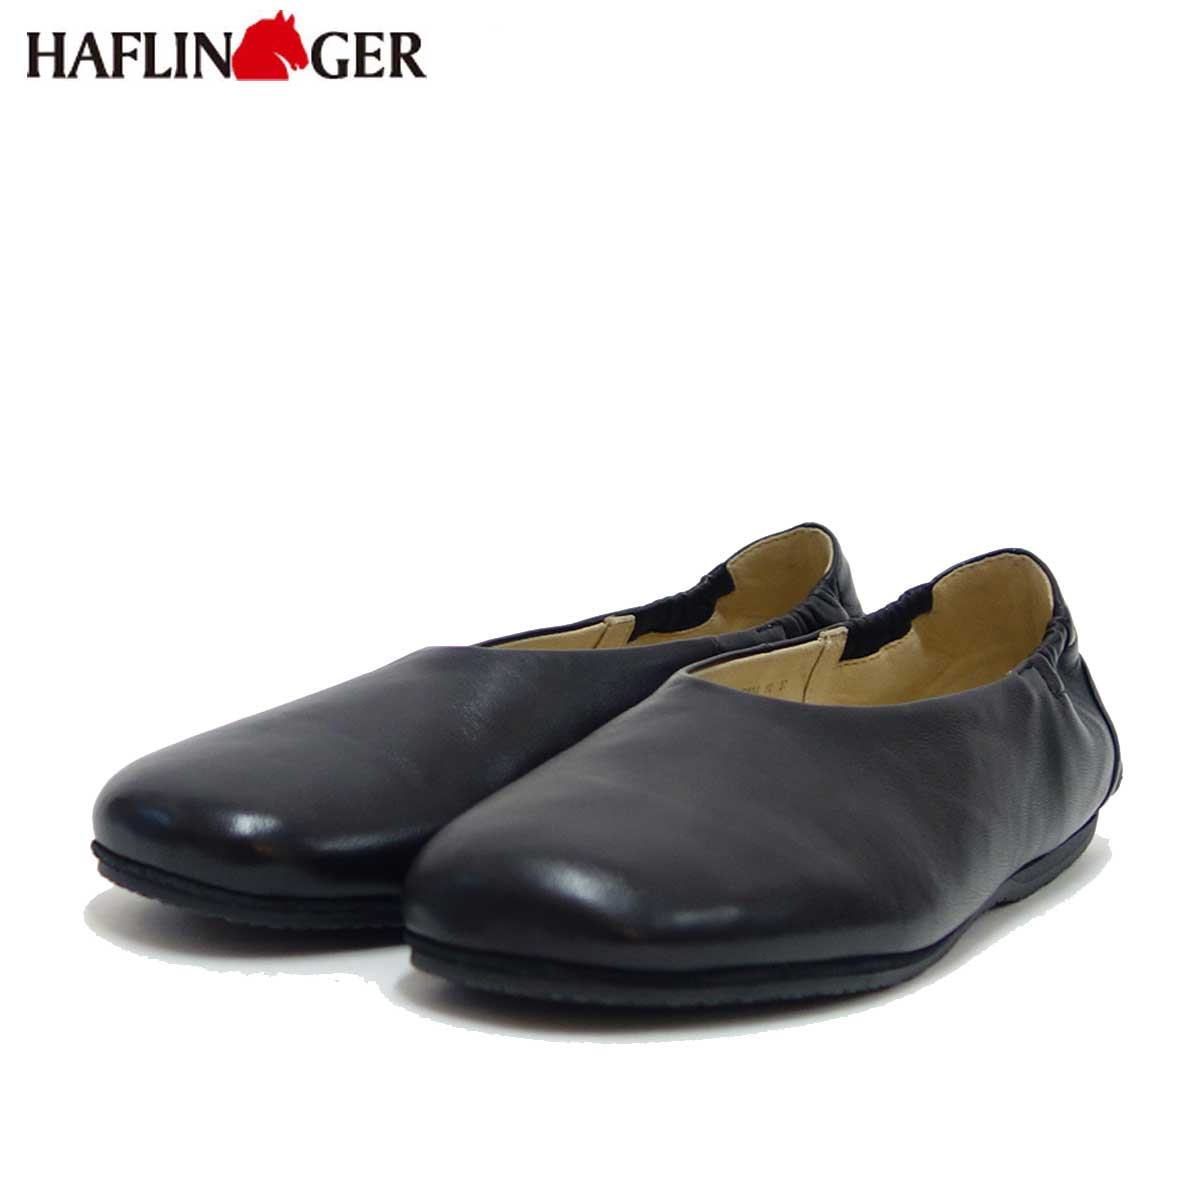 HAFLINGER ハフリンガー ステファニー HL 45101901 ブラック 「靴」